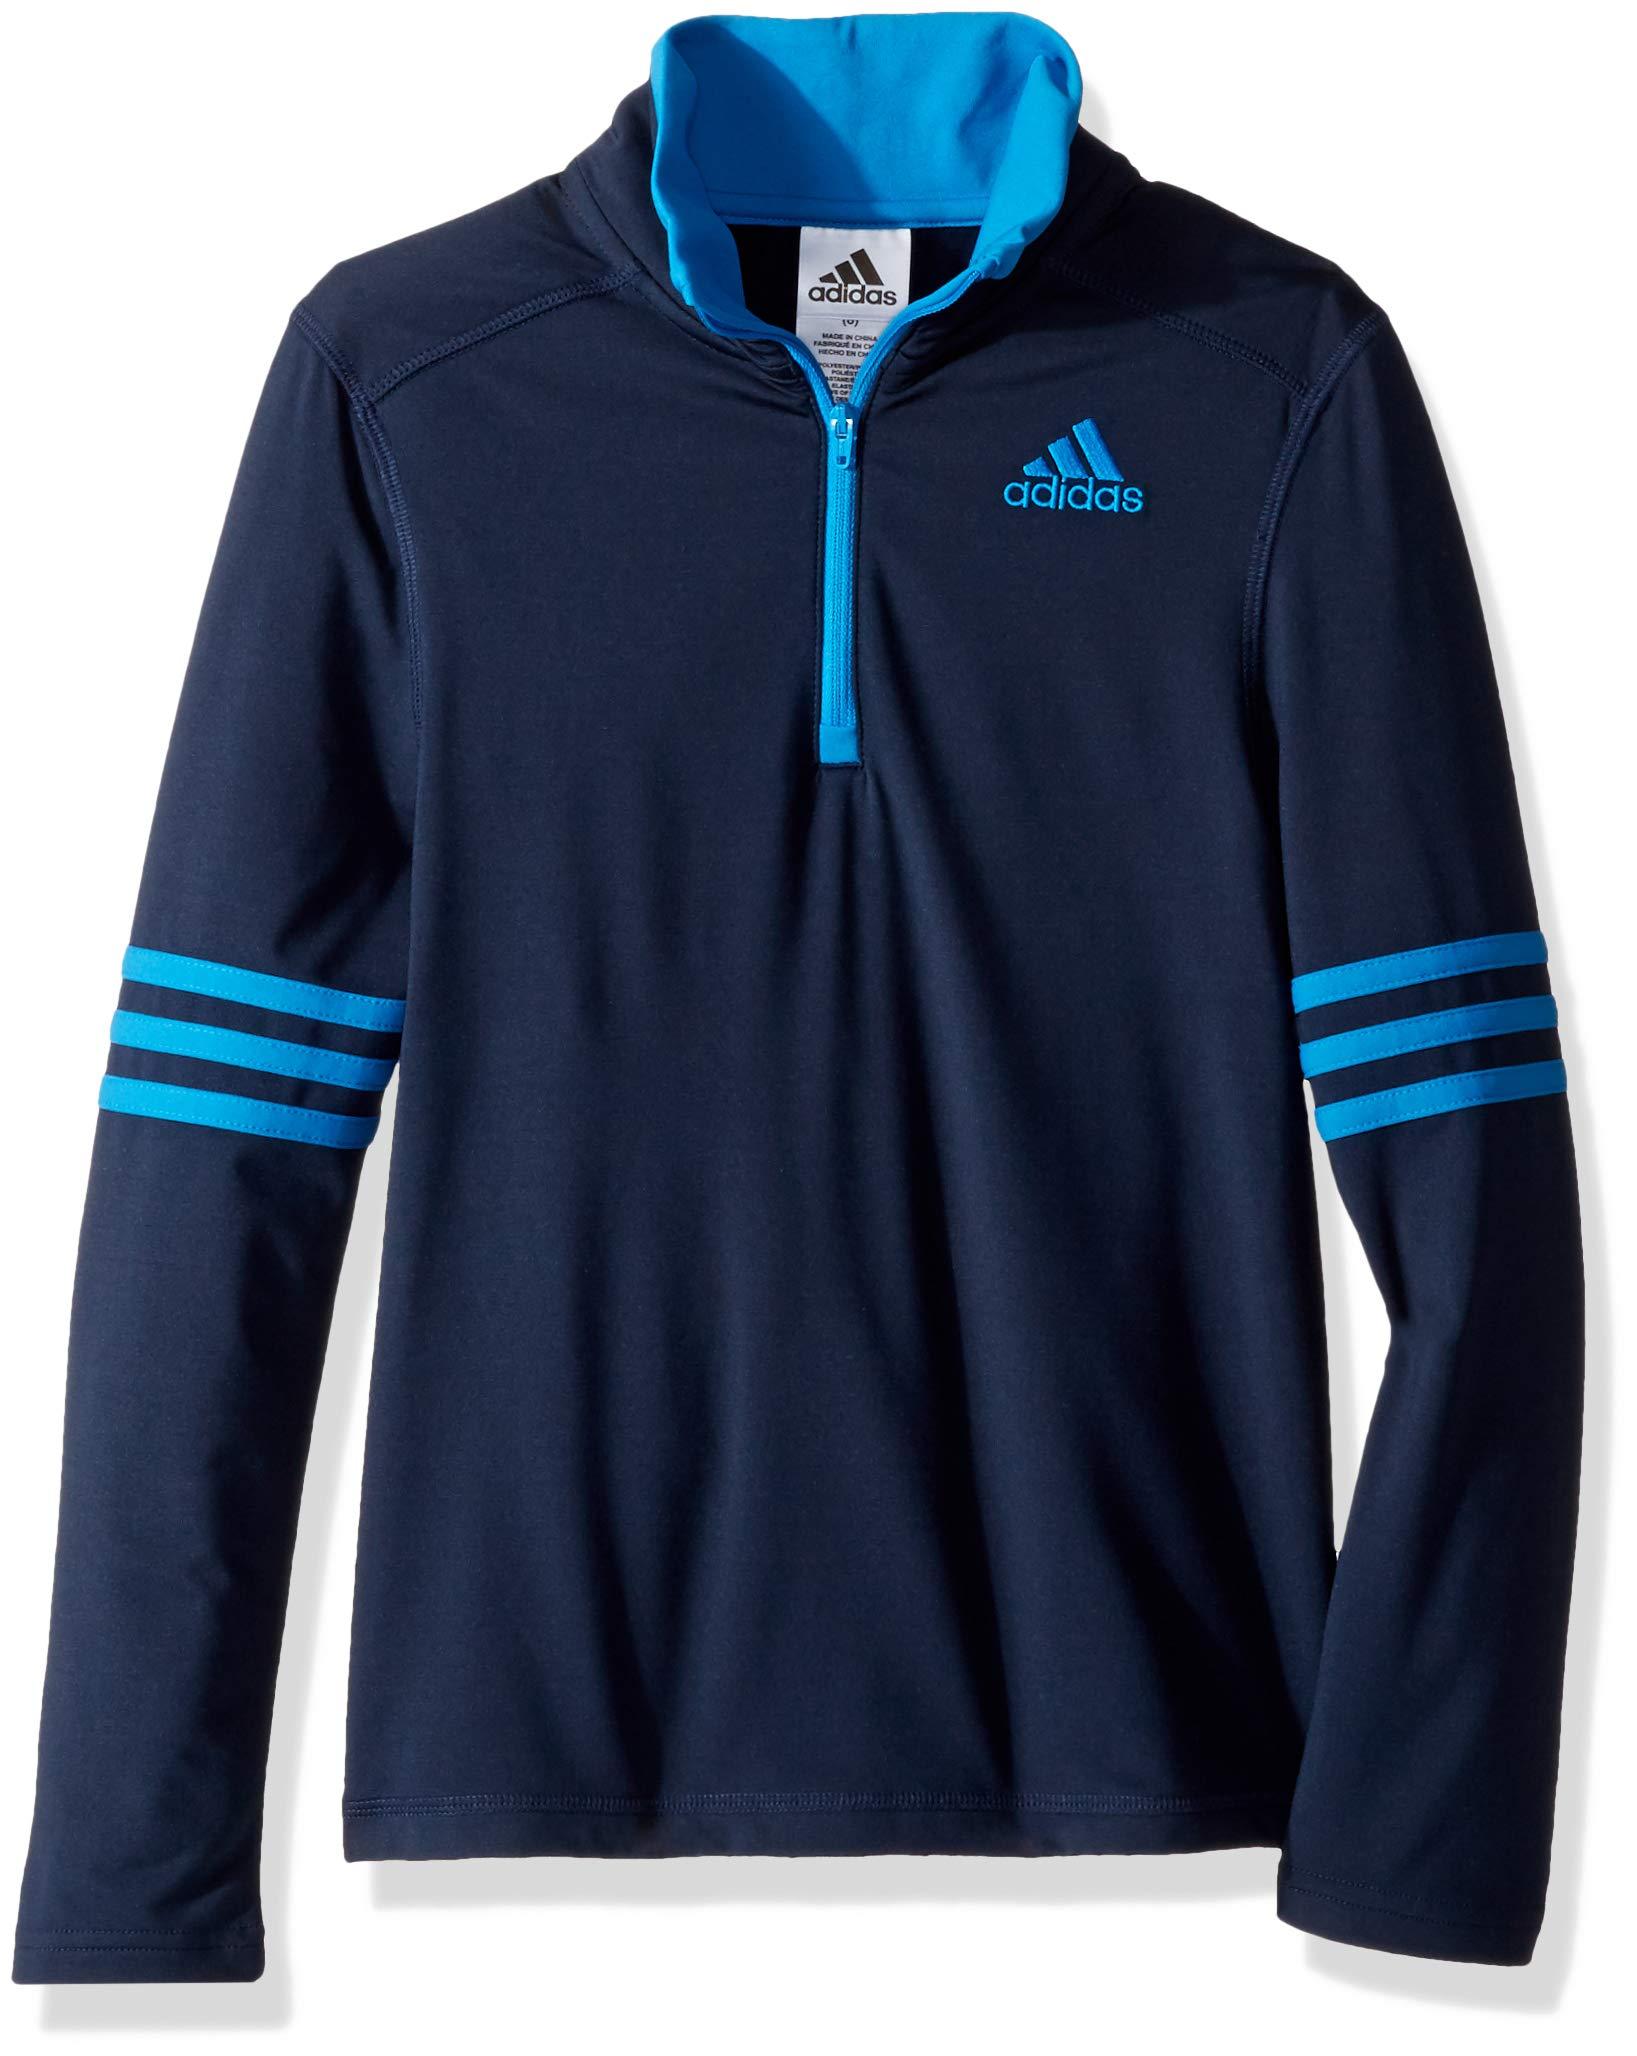 adidas Boys' Little Athletic Quarterzip, Navy/Blue, 2T